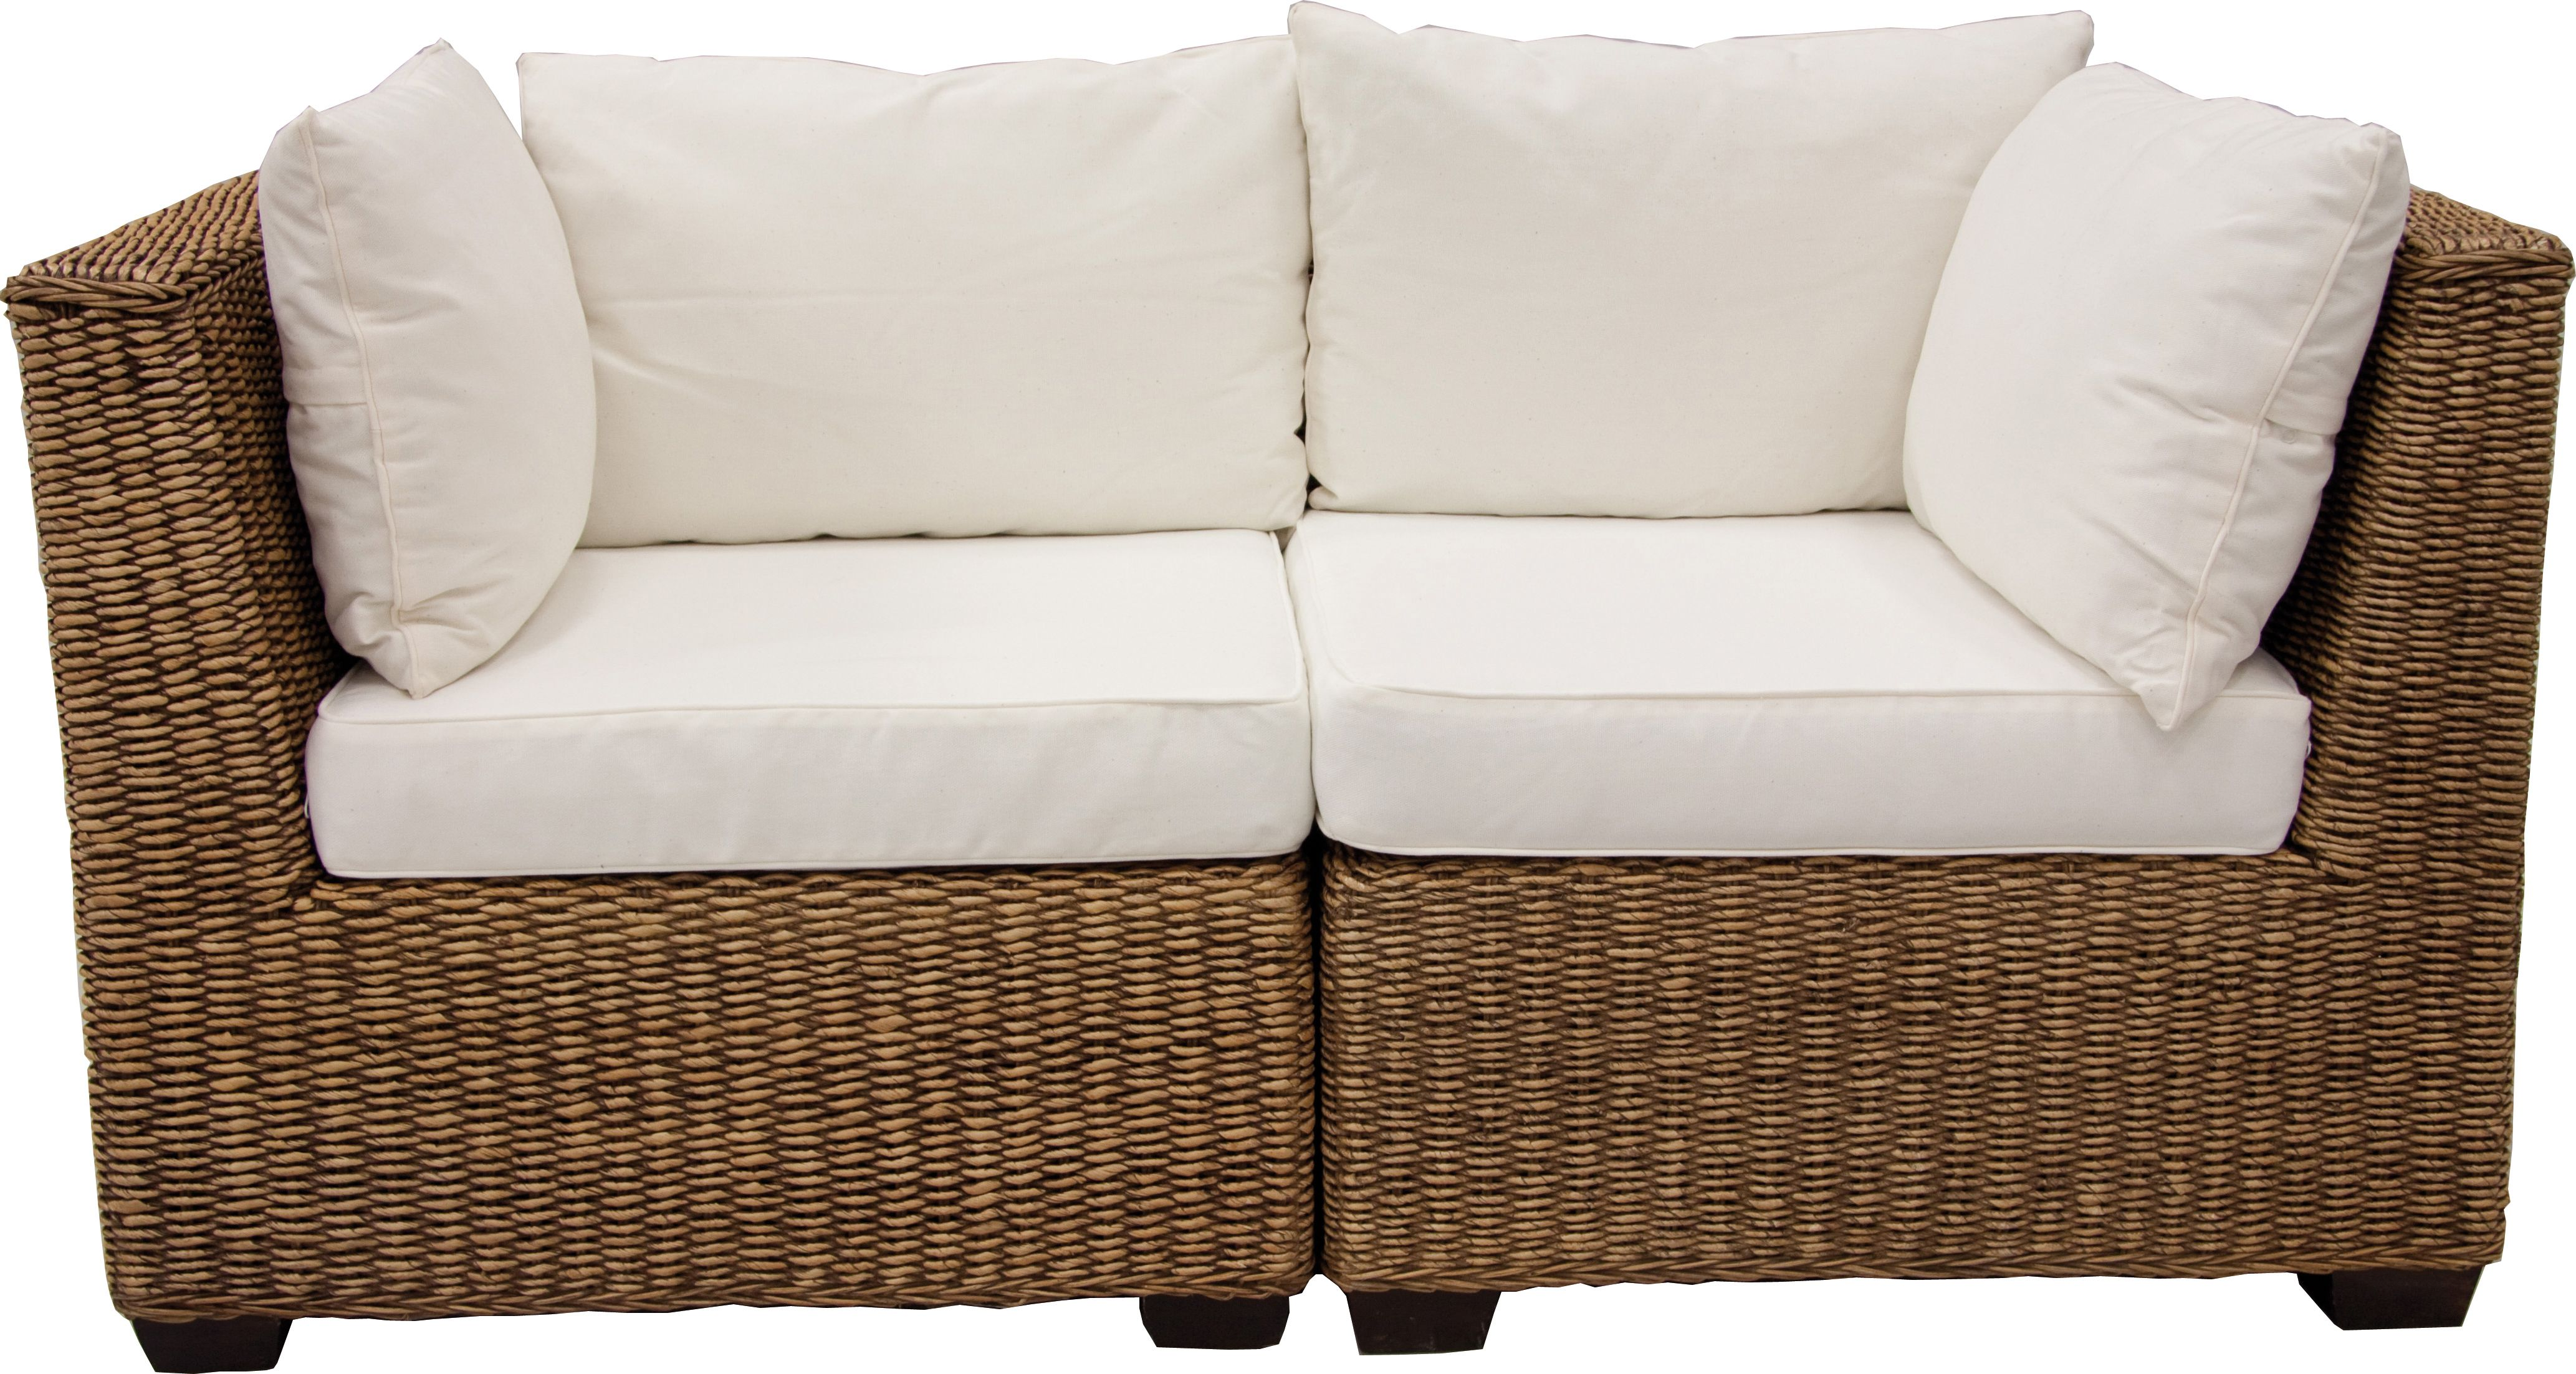 fauteuil d 39 angle en jacinthe. Black Bedroom Furniture Sets. Home Design Ideas